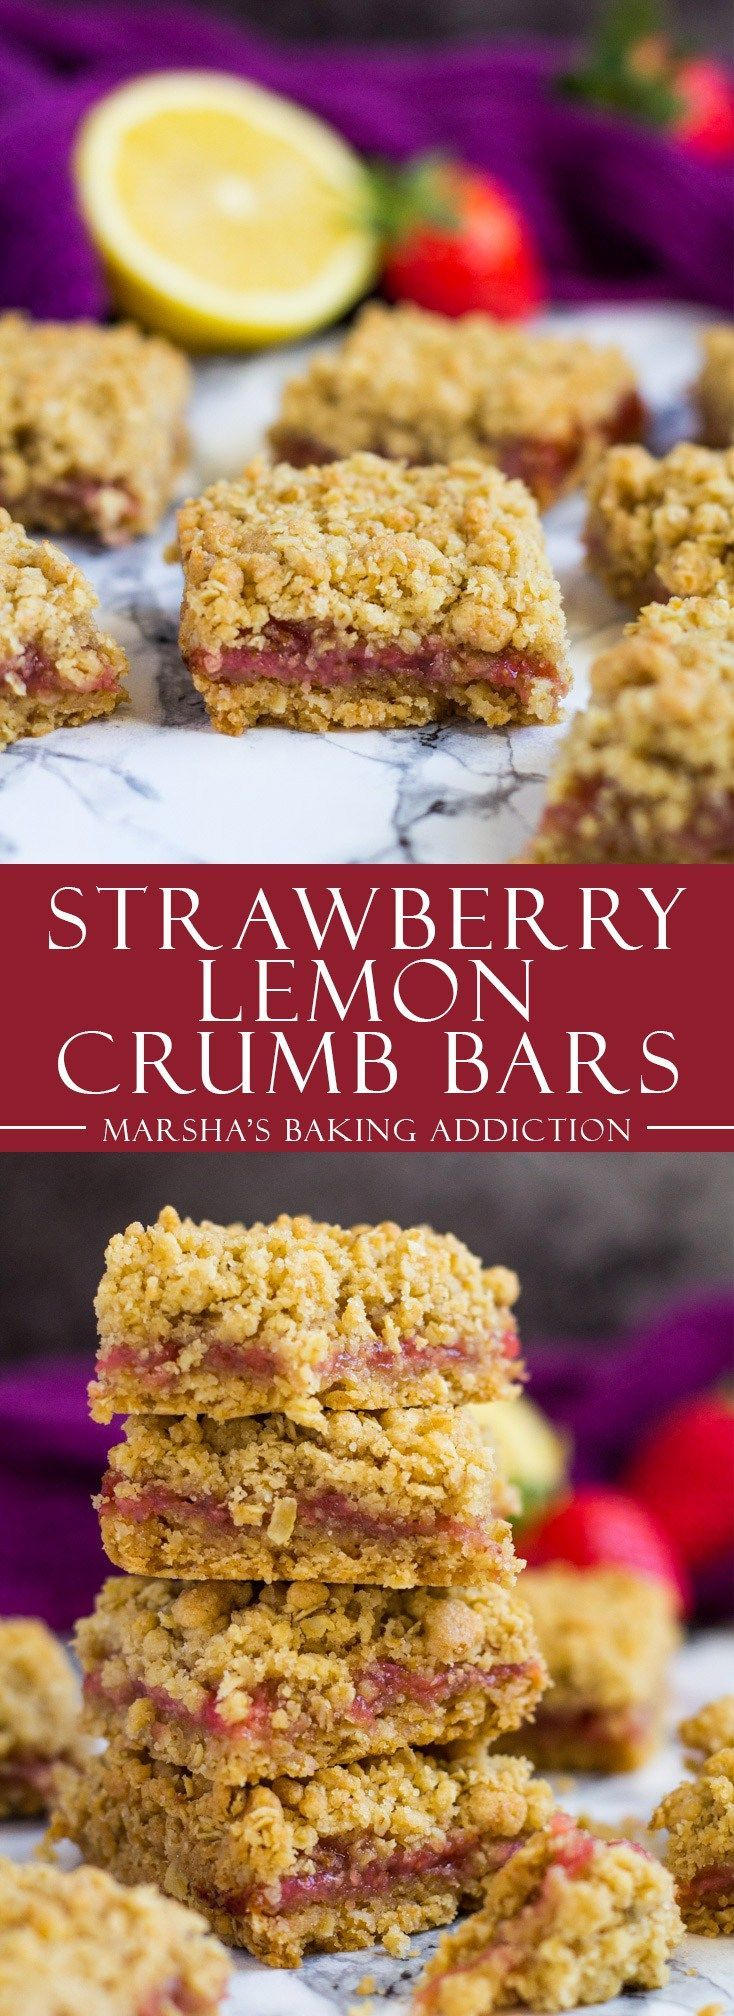 Strawberry Lemon Crumb Bars | http://marshasbakingaddiction.com /marshasbakeblog/